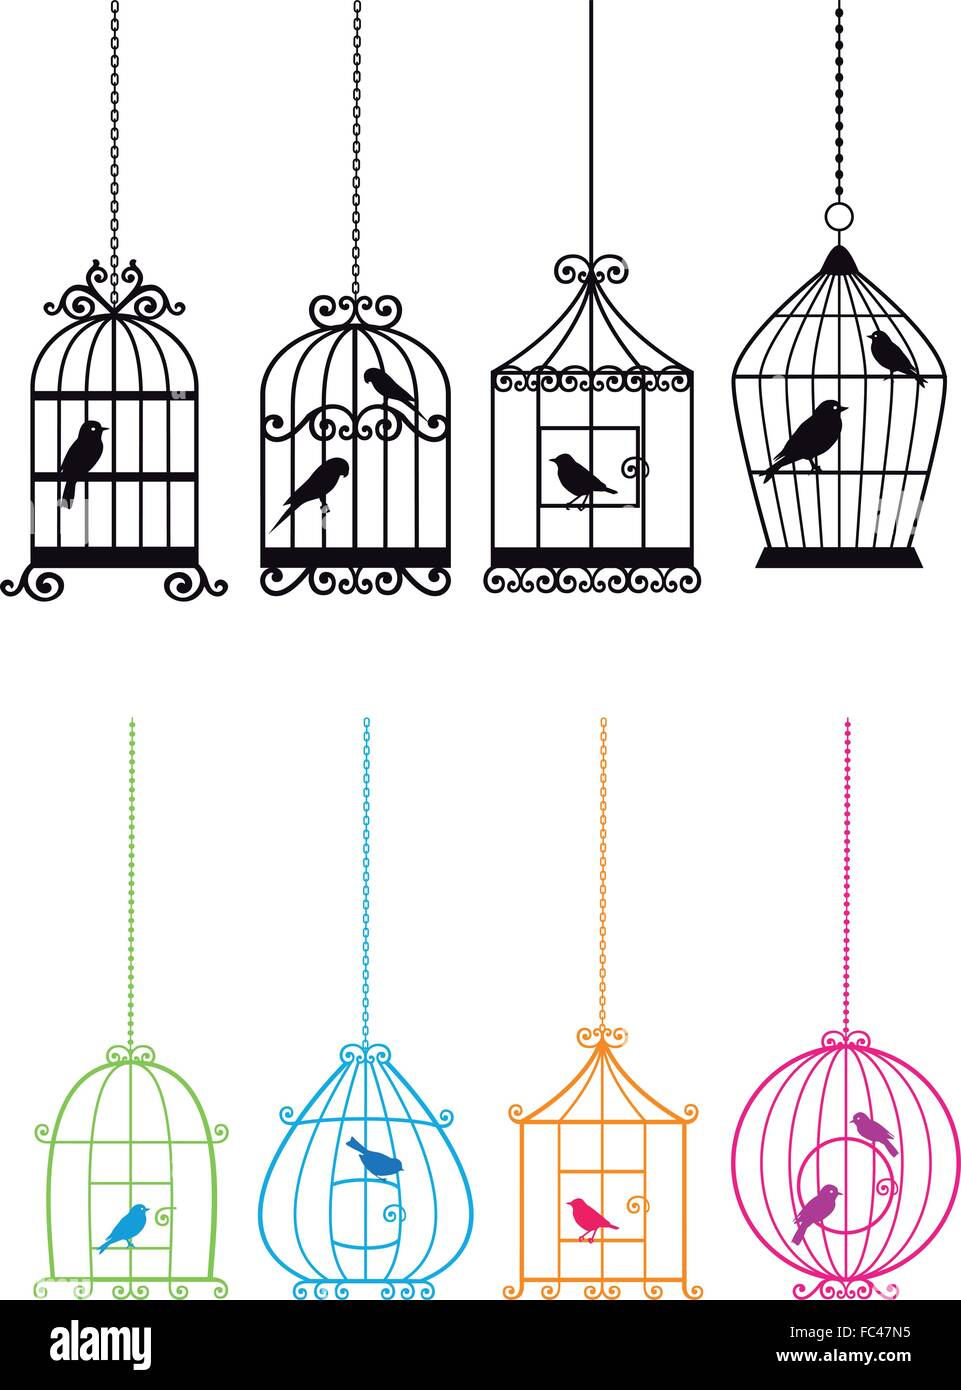 Vintage Vogelkäfig set mit Vögel, Vektor-illustration Stockbild